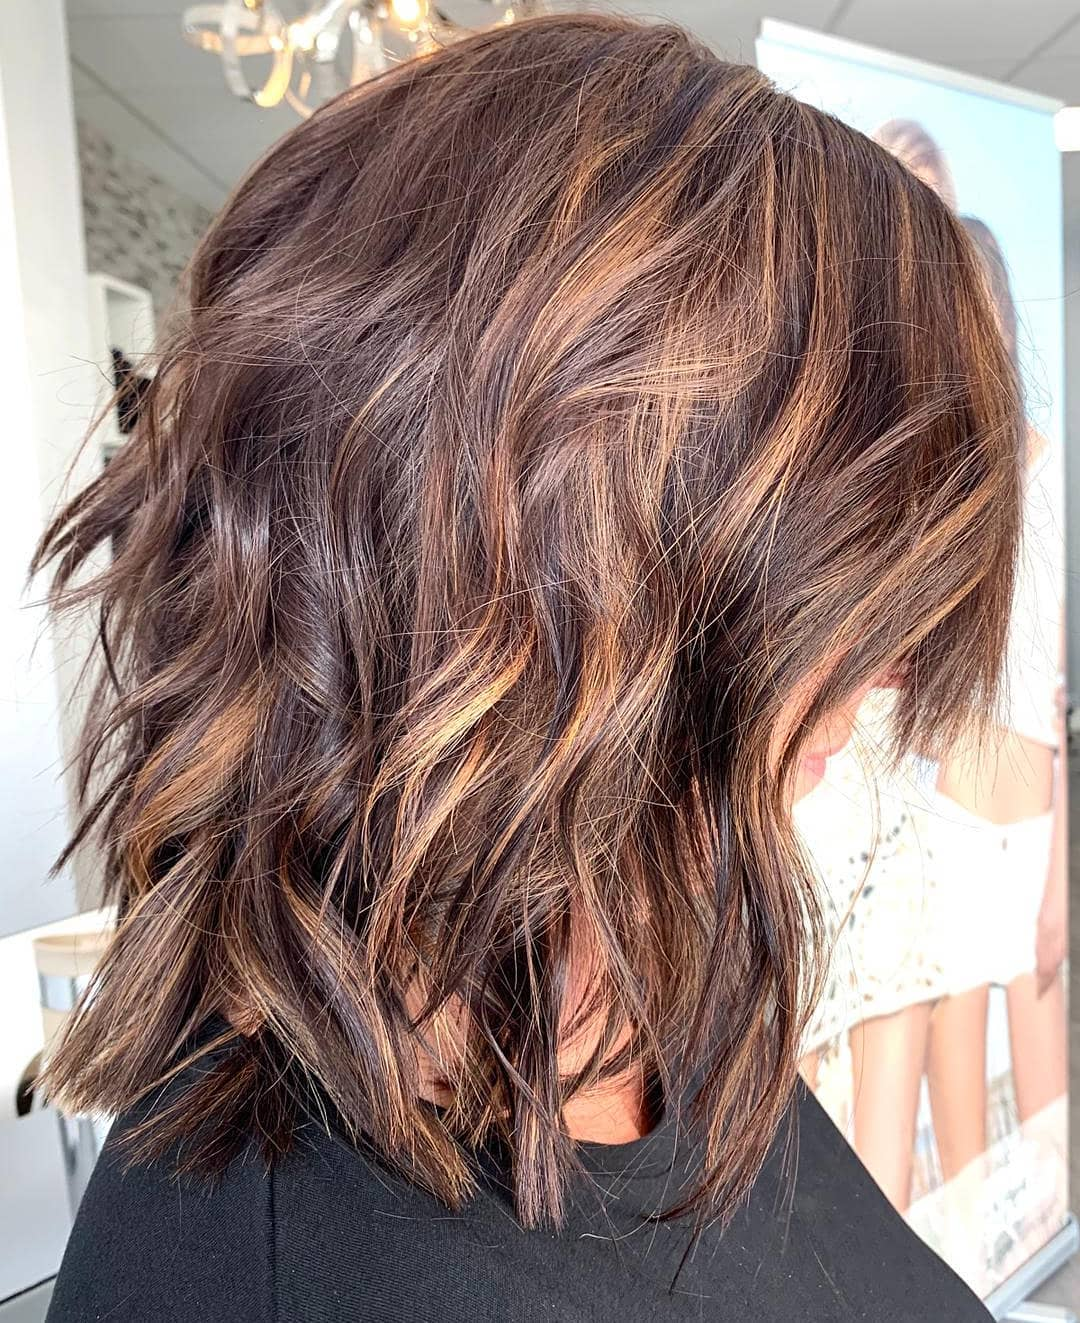 beautiful hair colours At Urban Coiffeur Hair Salon In Wolverhampton, West Midlands106382813_4063907883682584_8217474686448104772_n